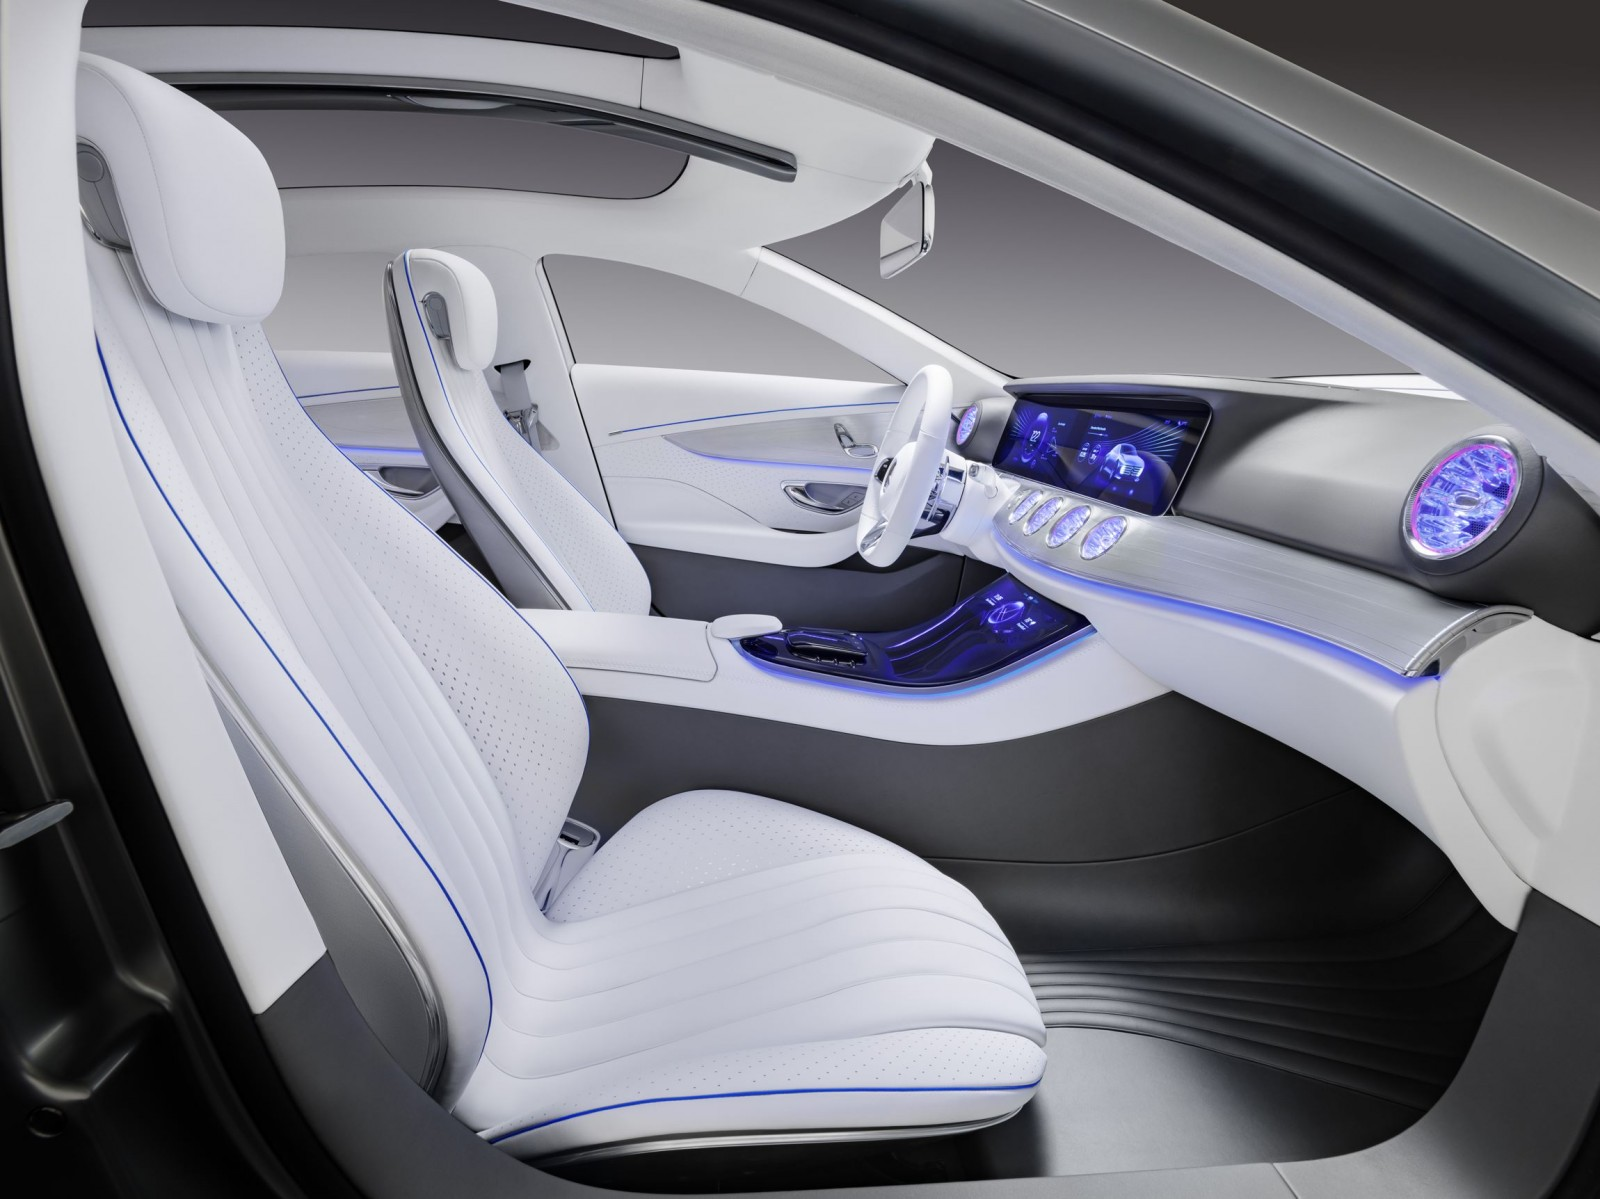 2015 mercedes benz concept iaa for Mercedes benz interieur